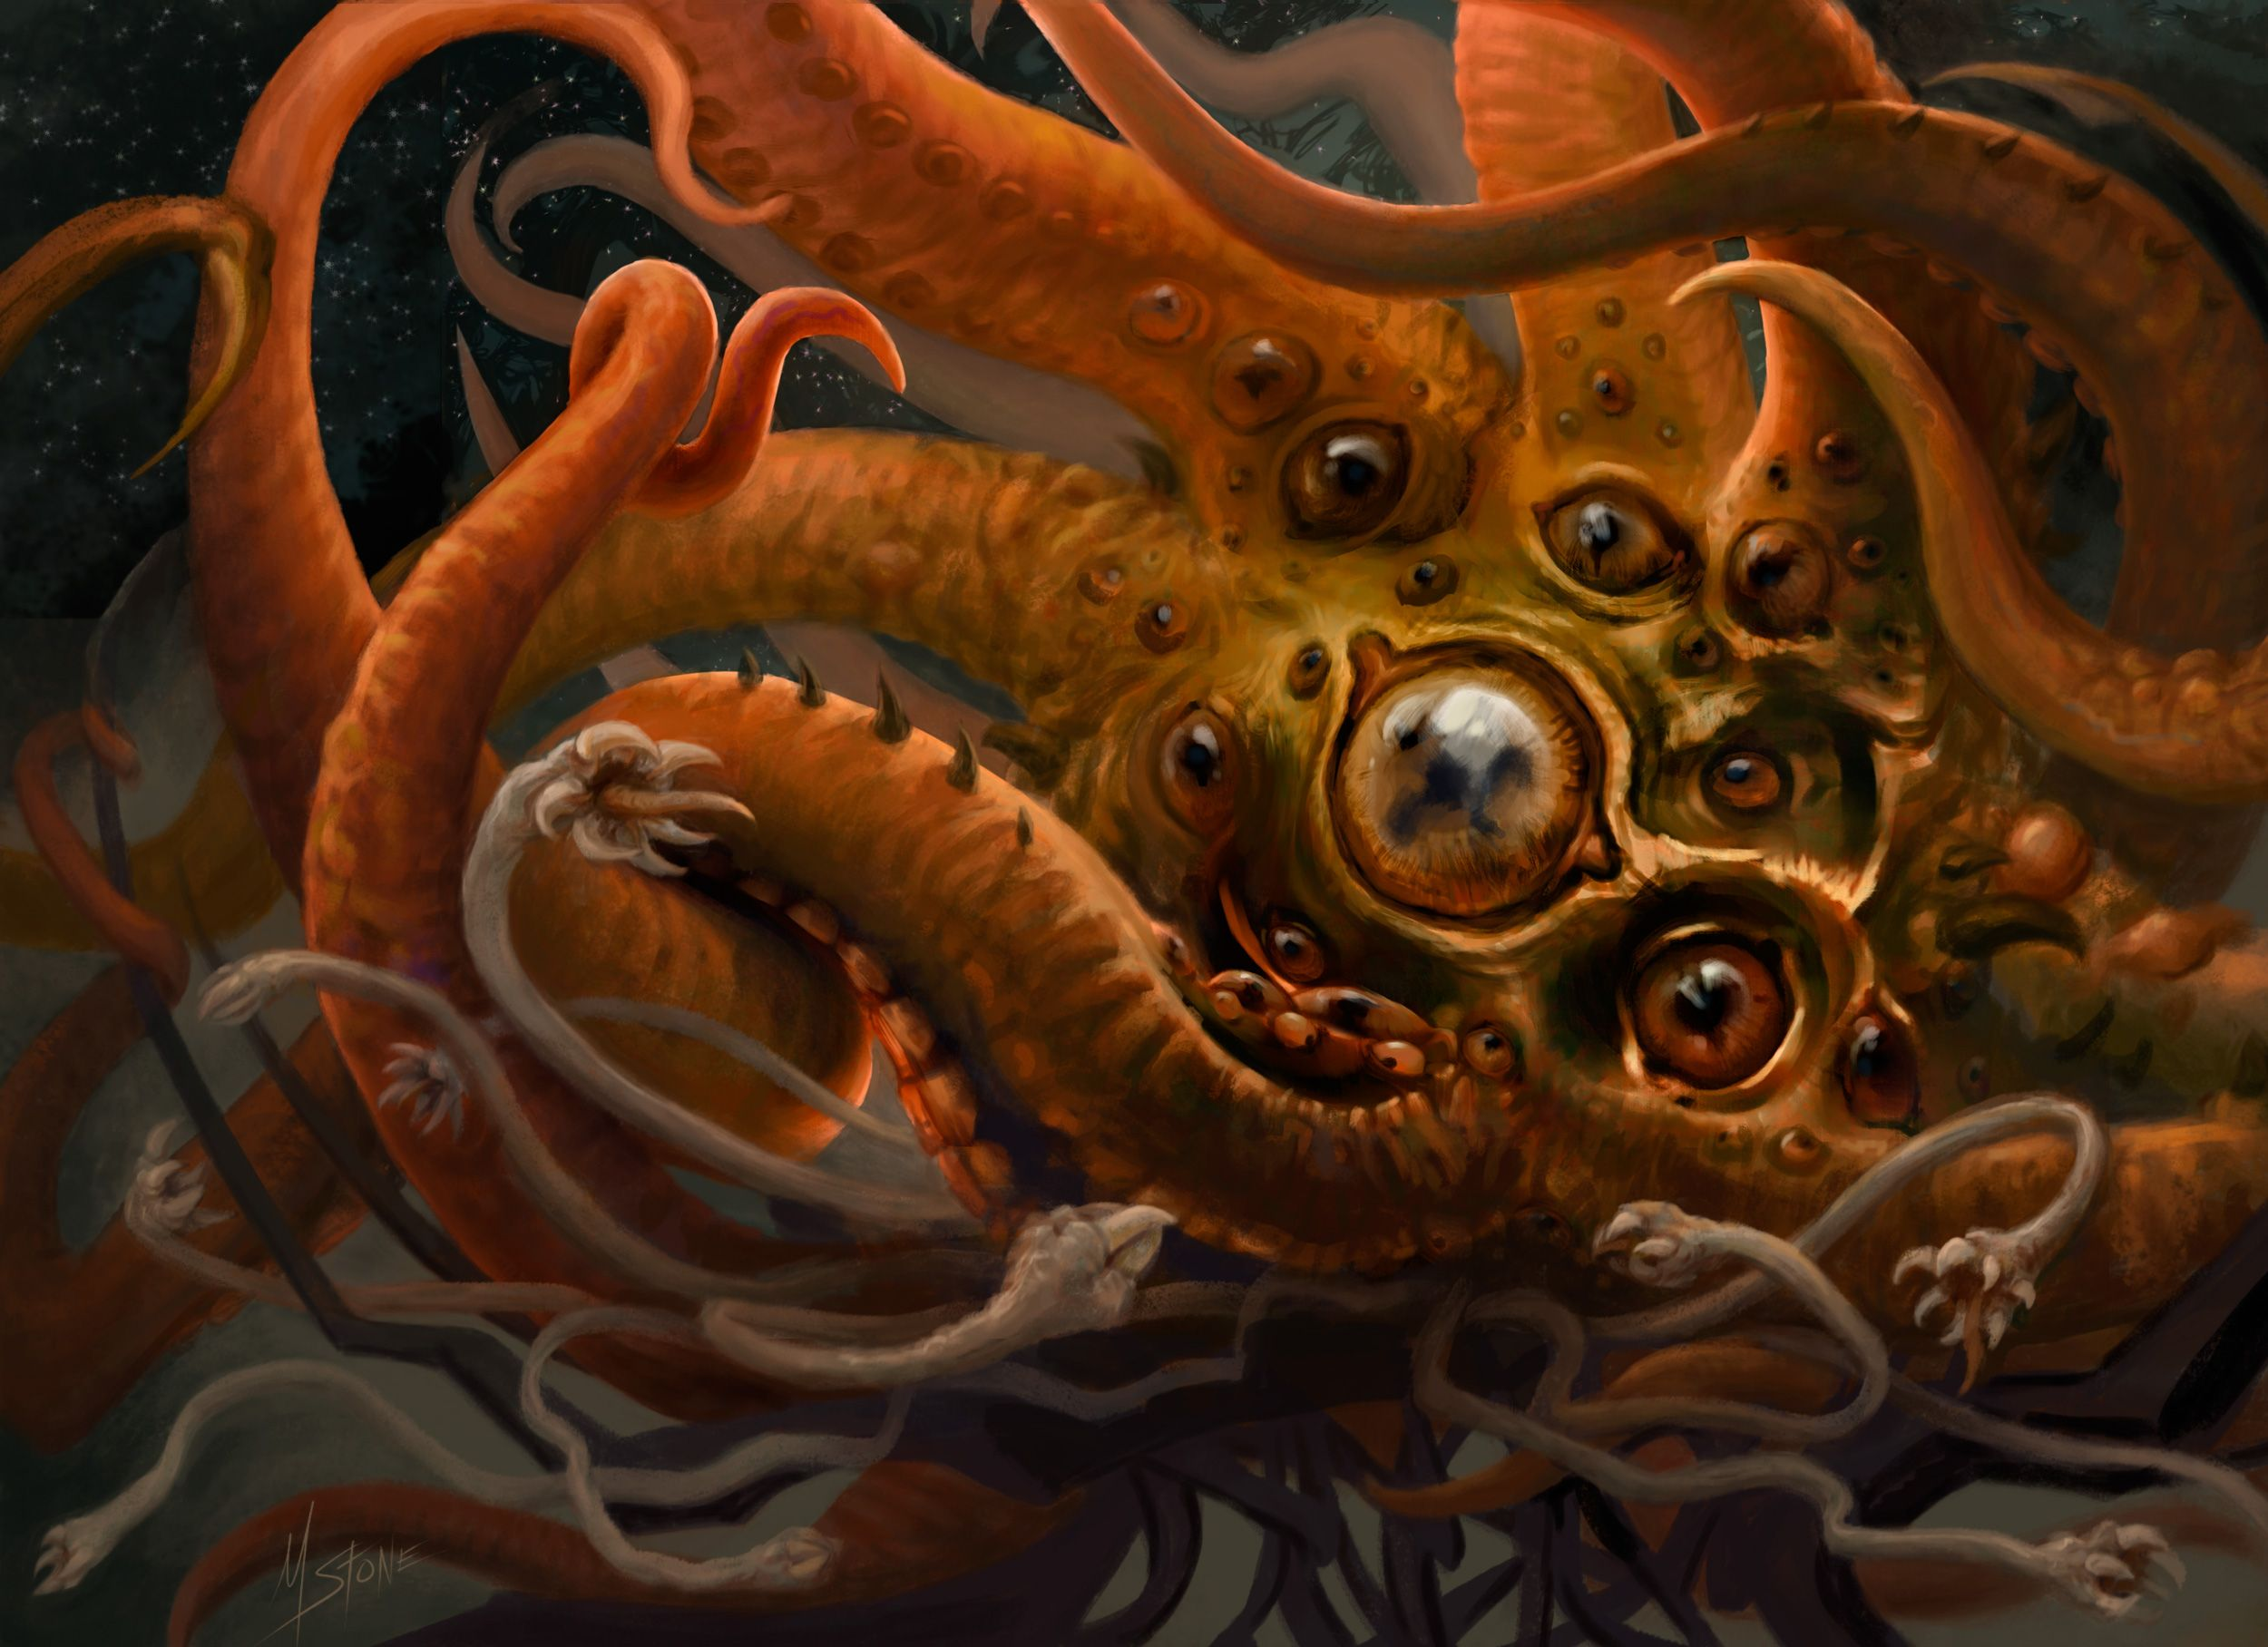 Yog Sothoth? Nyarlathotep? | Lovecraft cthulhu, Lovecraftian horror, Cthulhu mythos